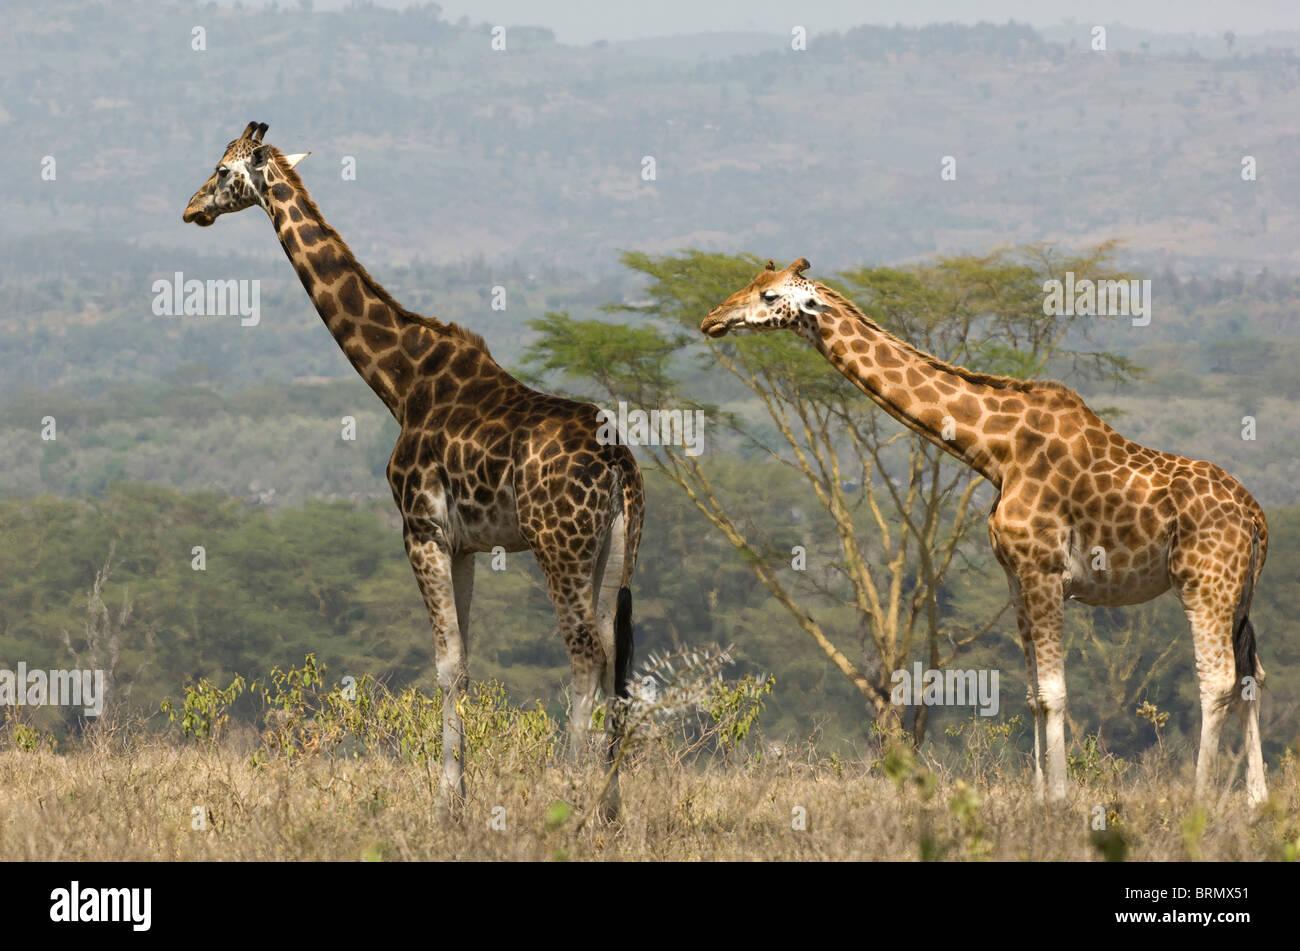 Two Rothschild's Giraffe (Giraffa camelopardalis Rothschild) standing near to each other - Stock Image